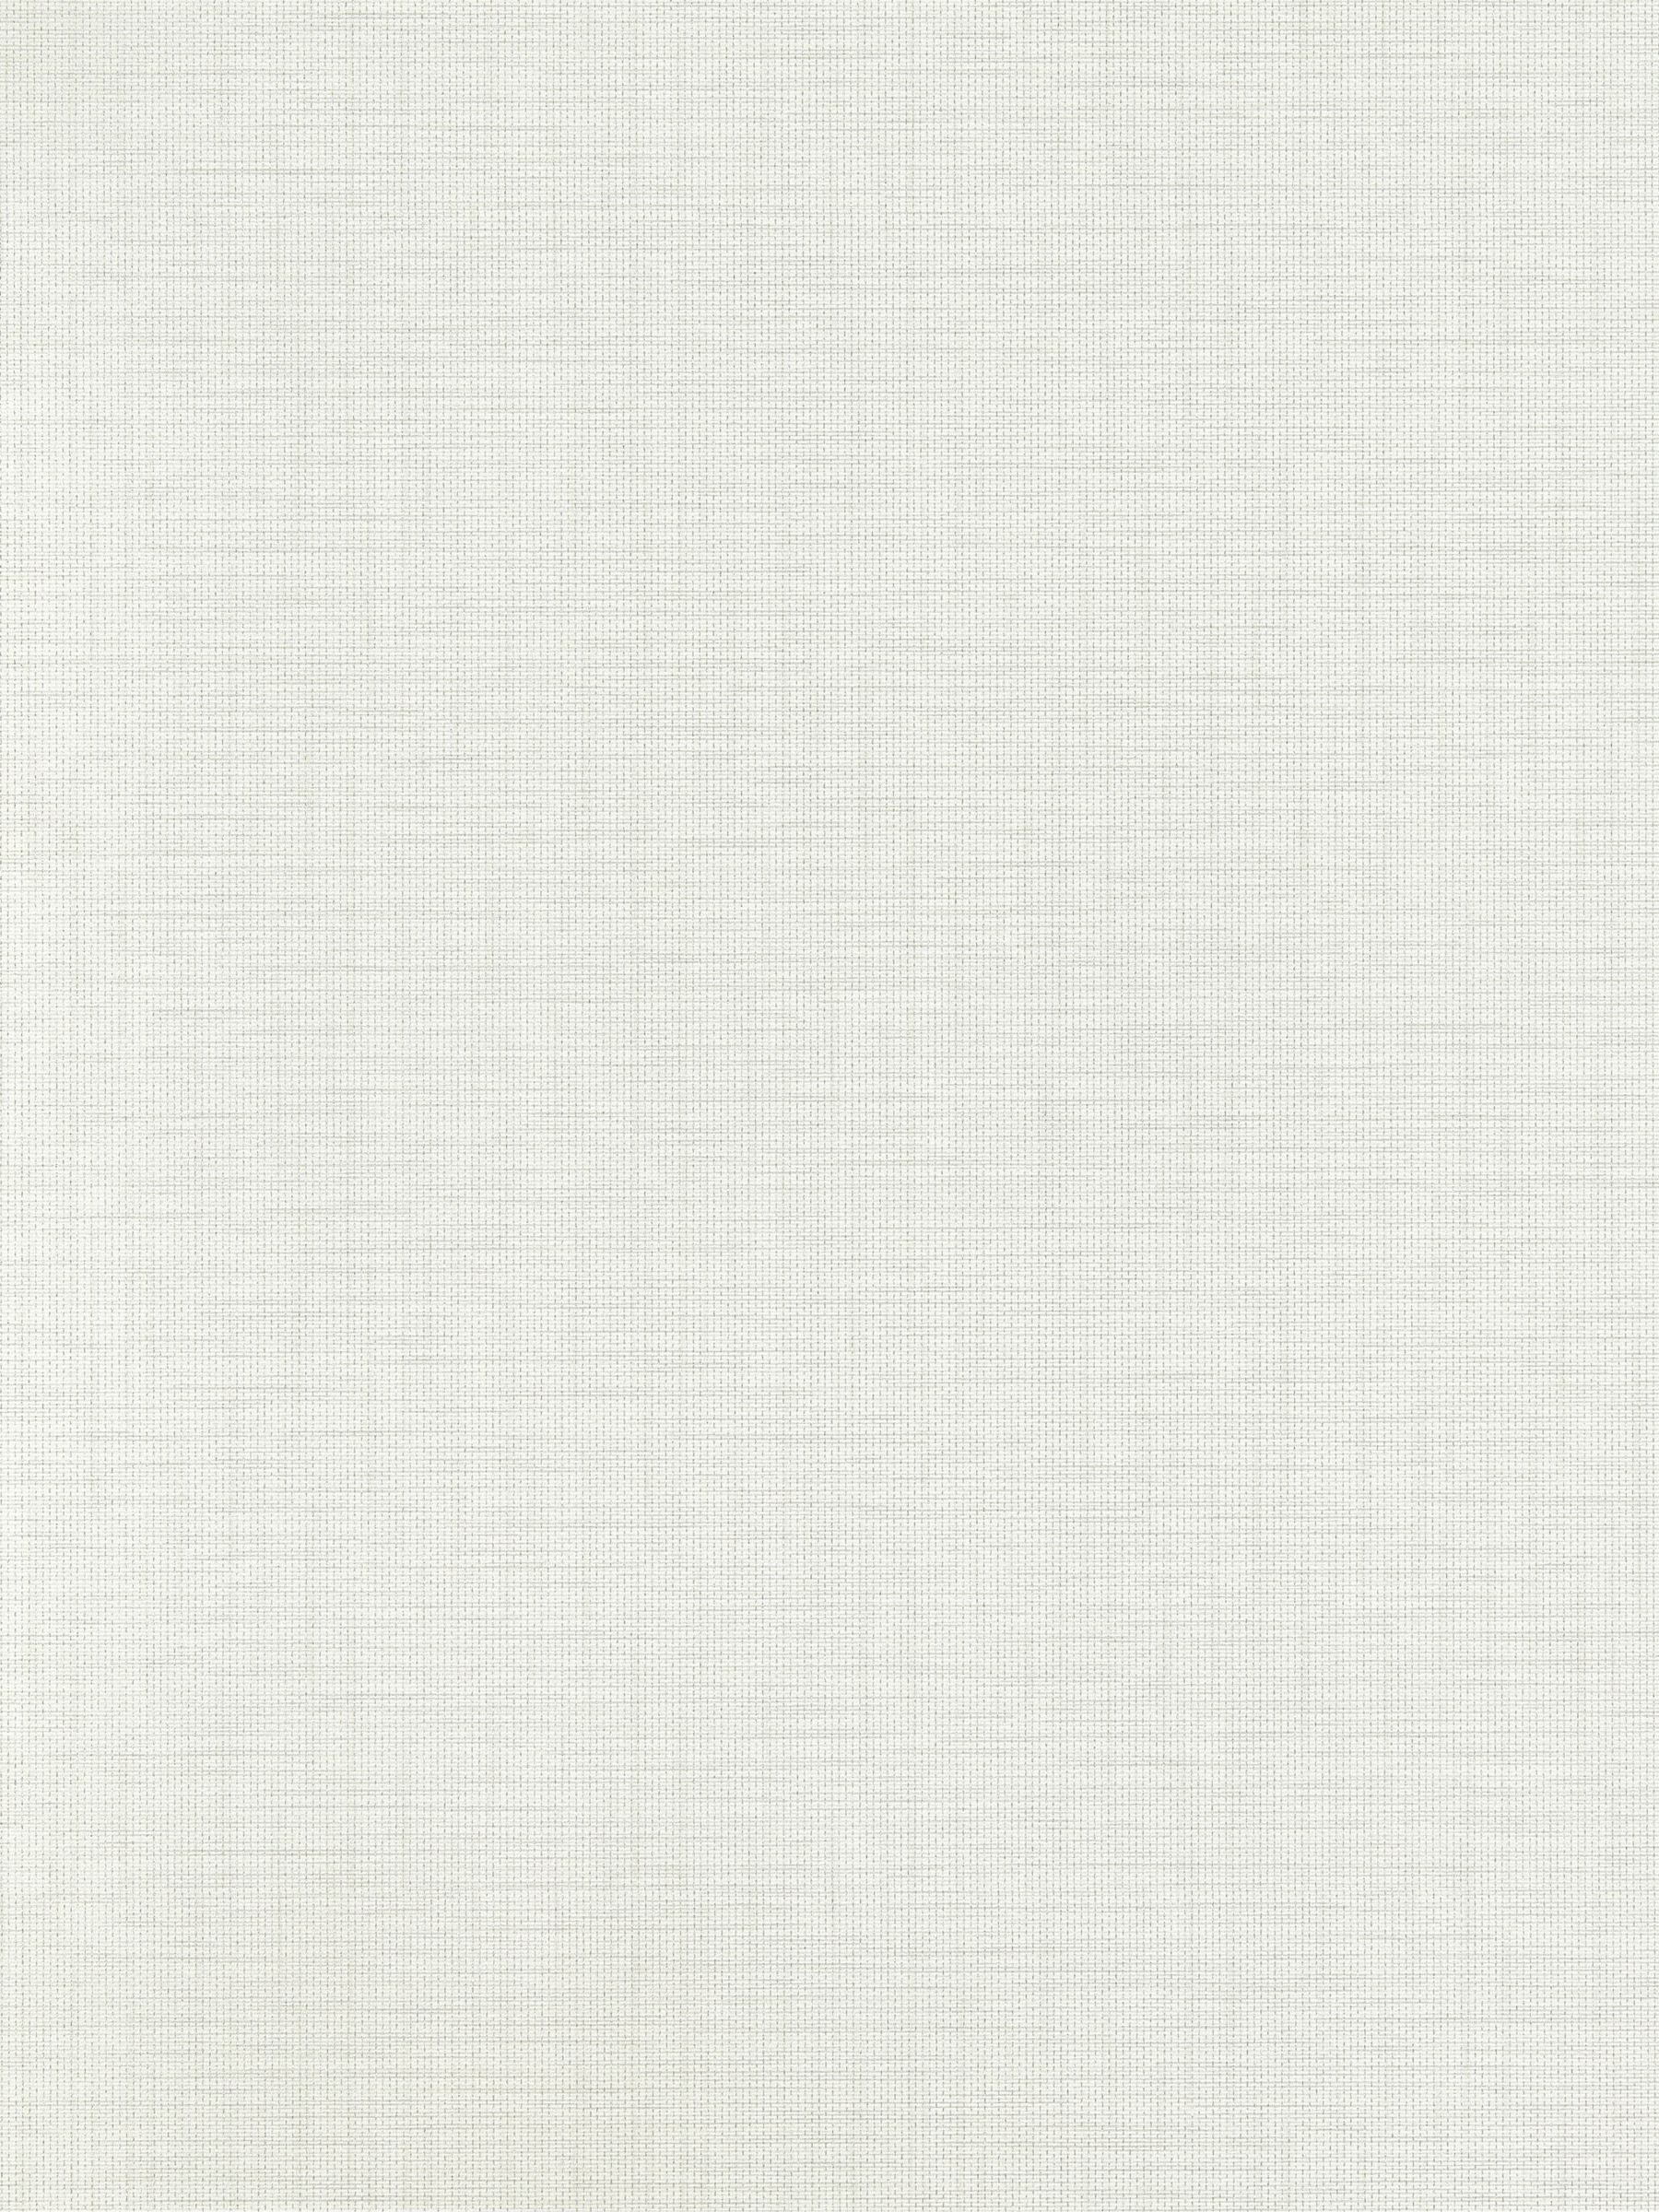 Harlequin Harlequin Lint Wallpaper